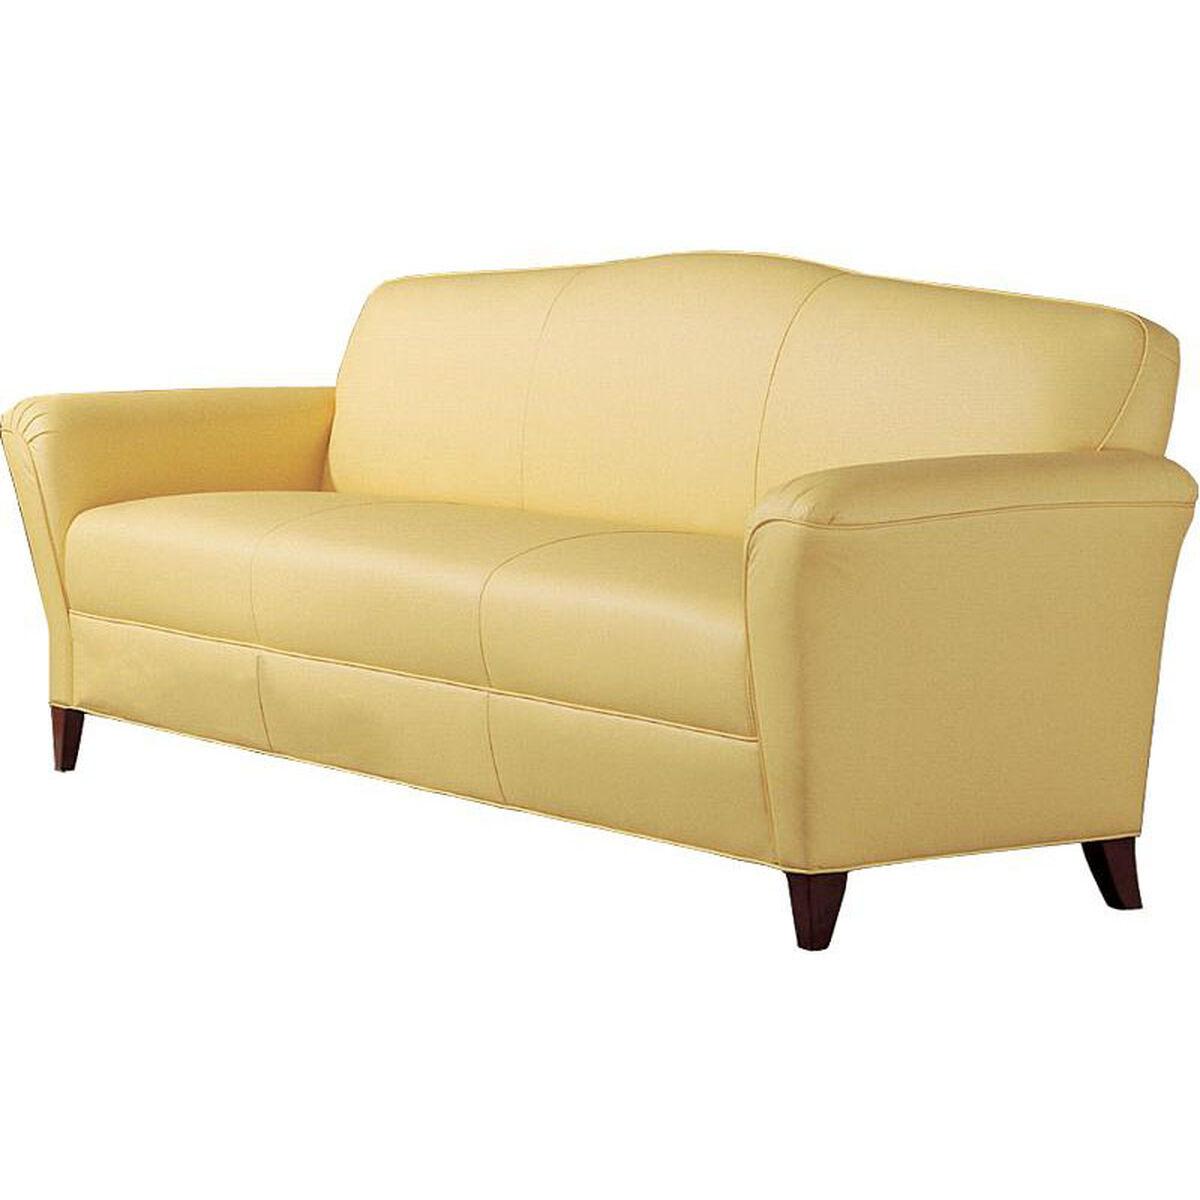 High Point Furniture Industries 6403 Hpf 6403